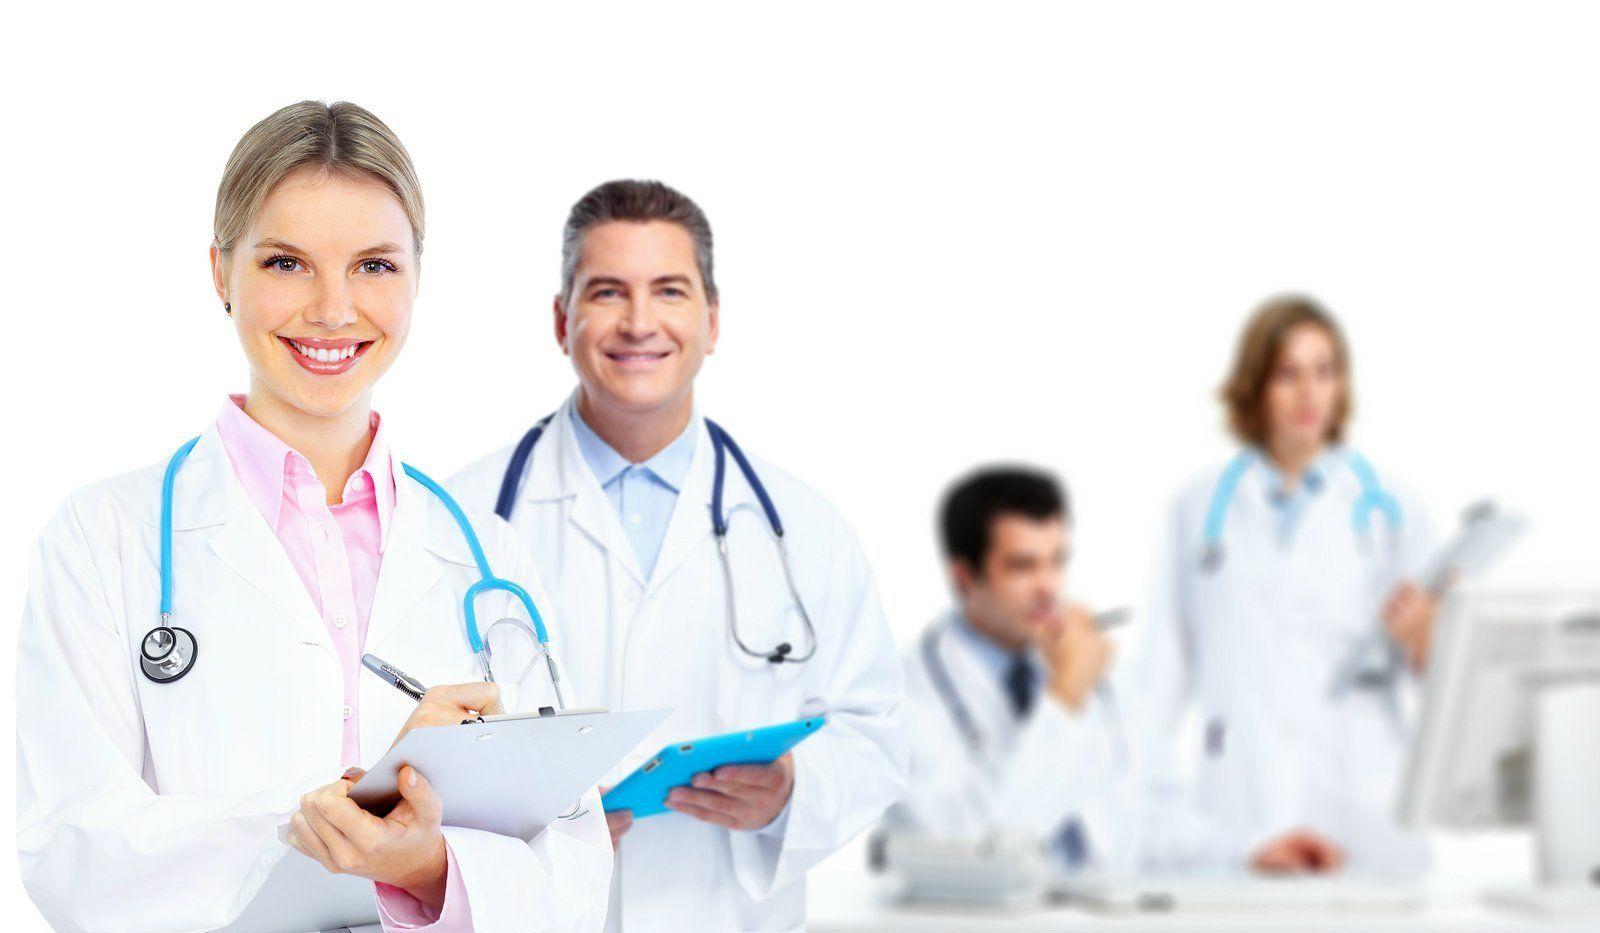 medical-doctor-salary-medical